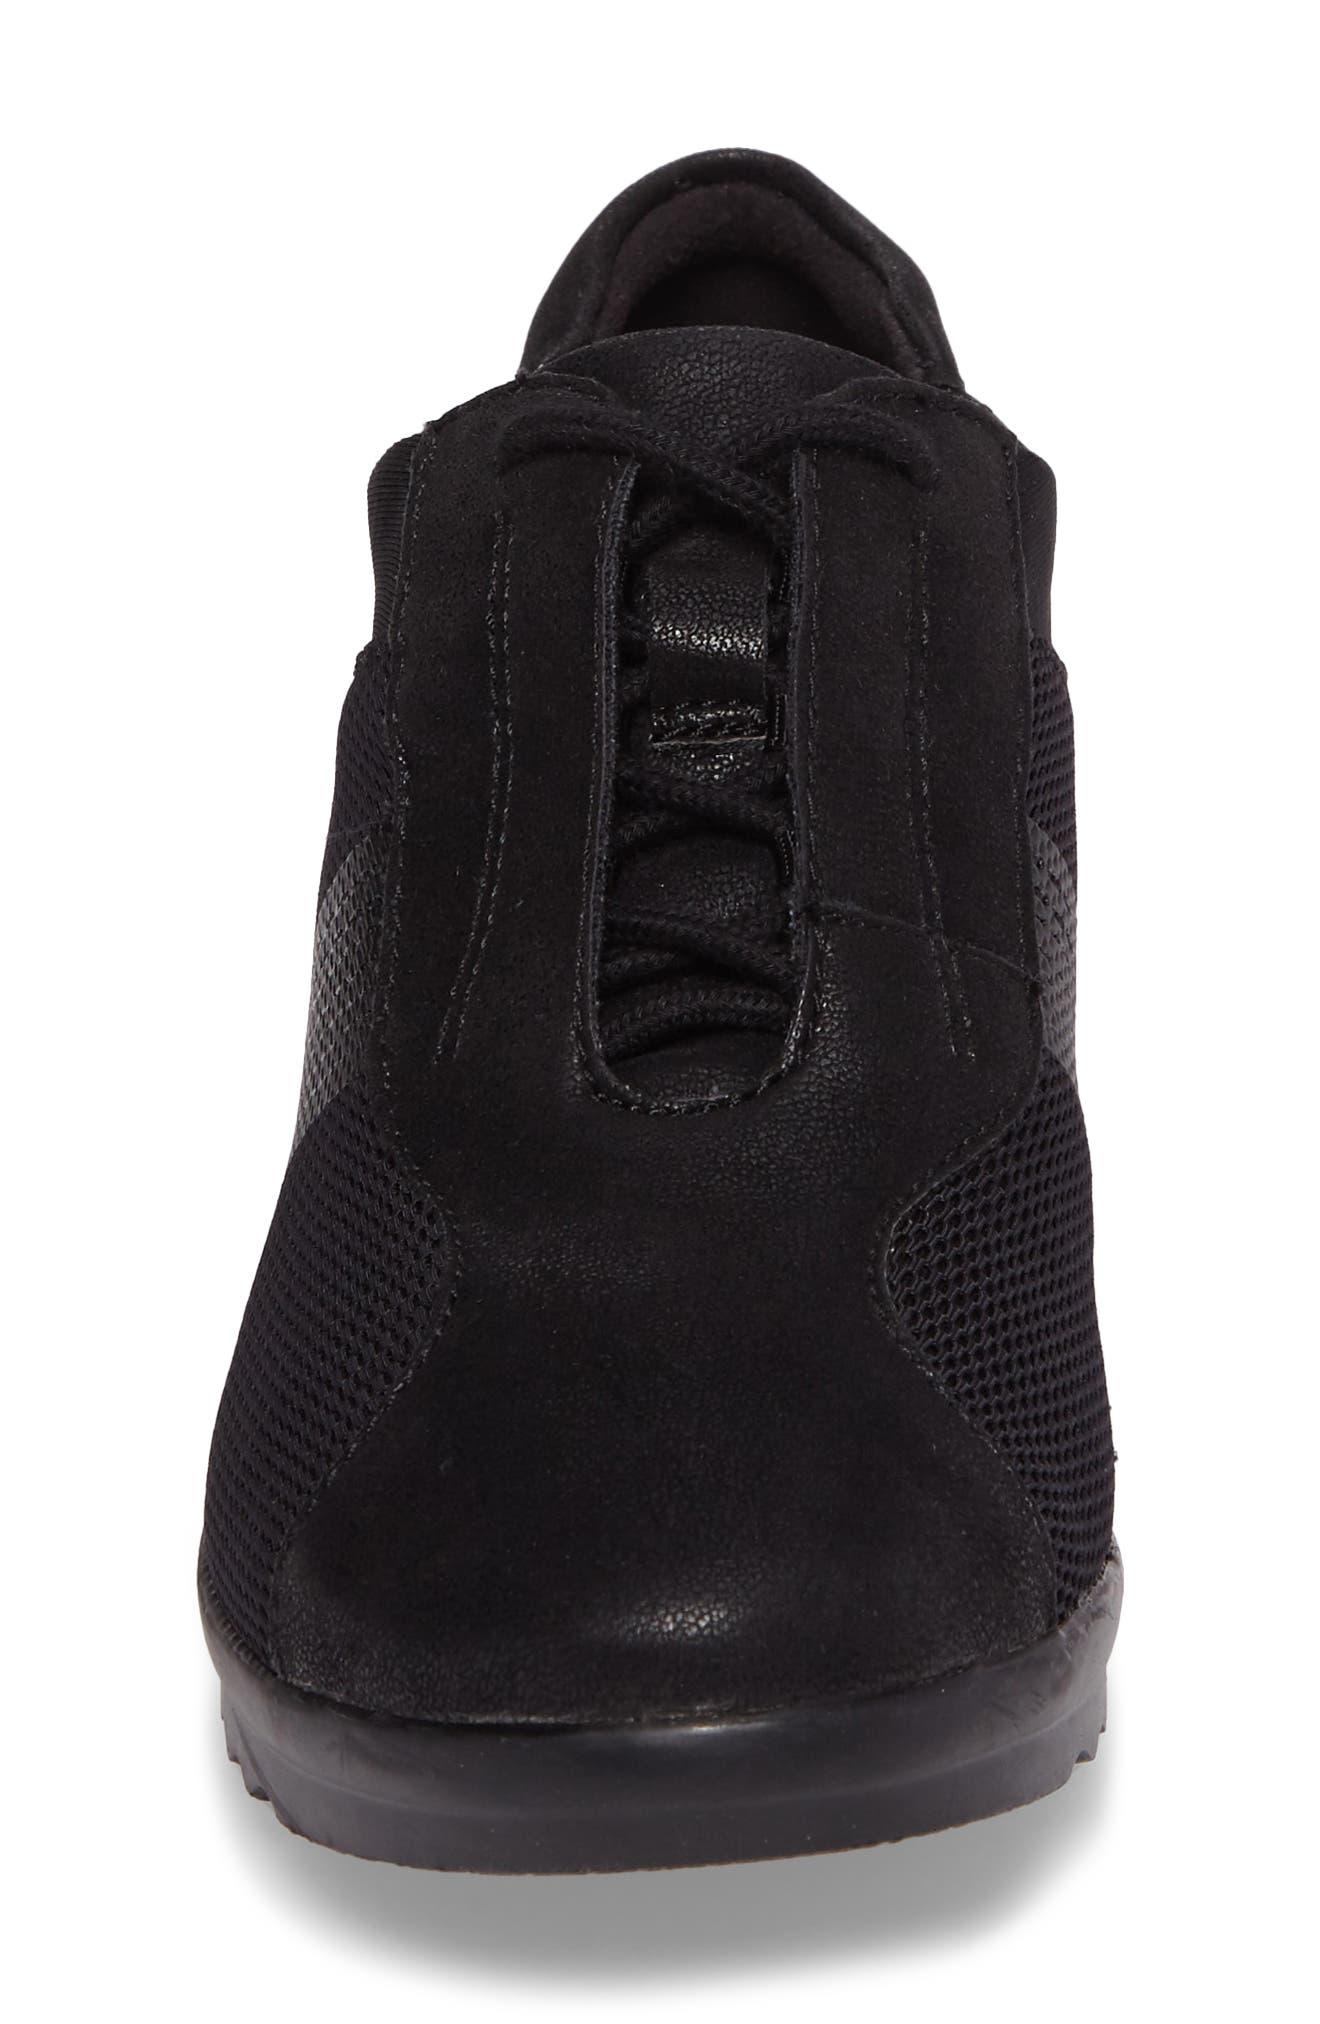 Caddell Fly Sneaker,                             Alternate thumbnail 4, color,                             BLACK FABRIC